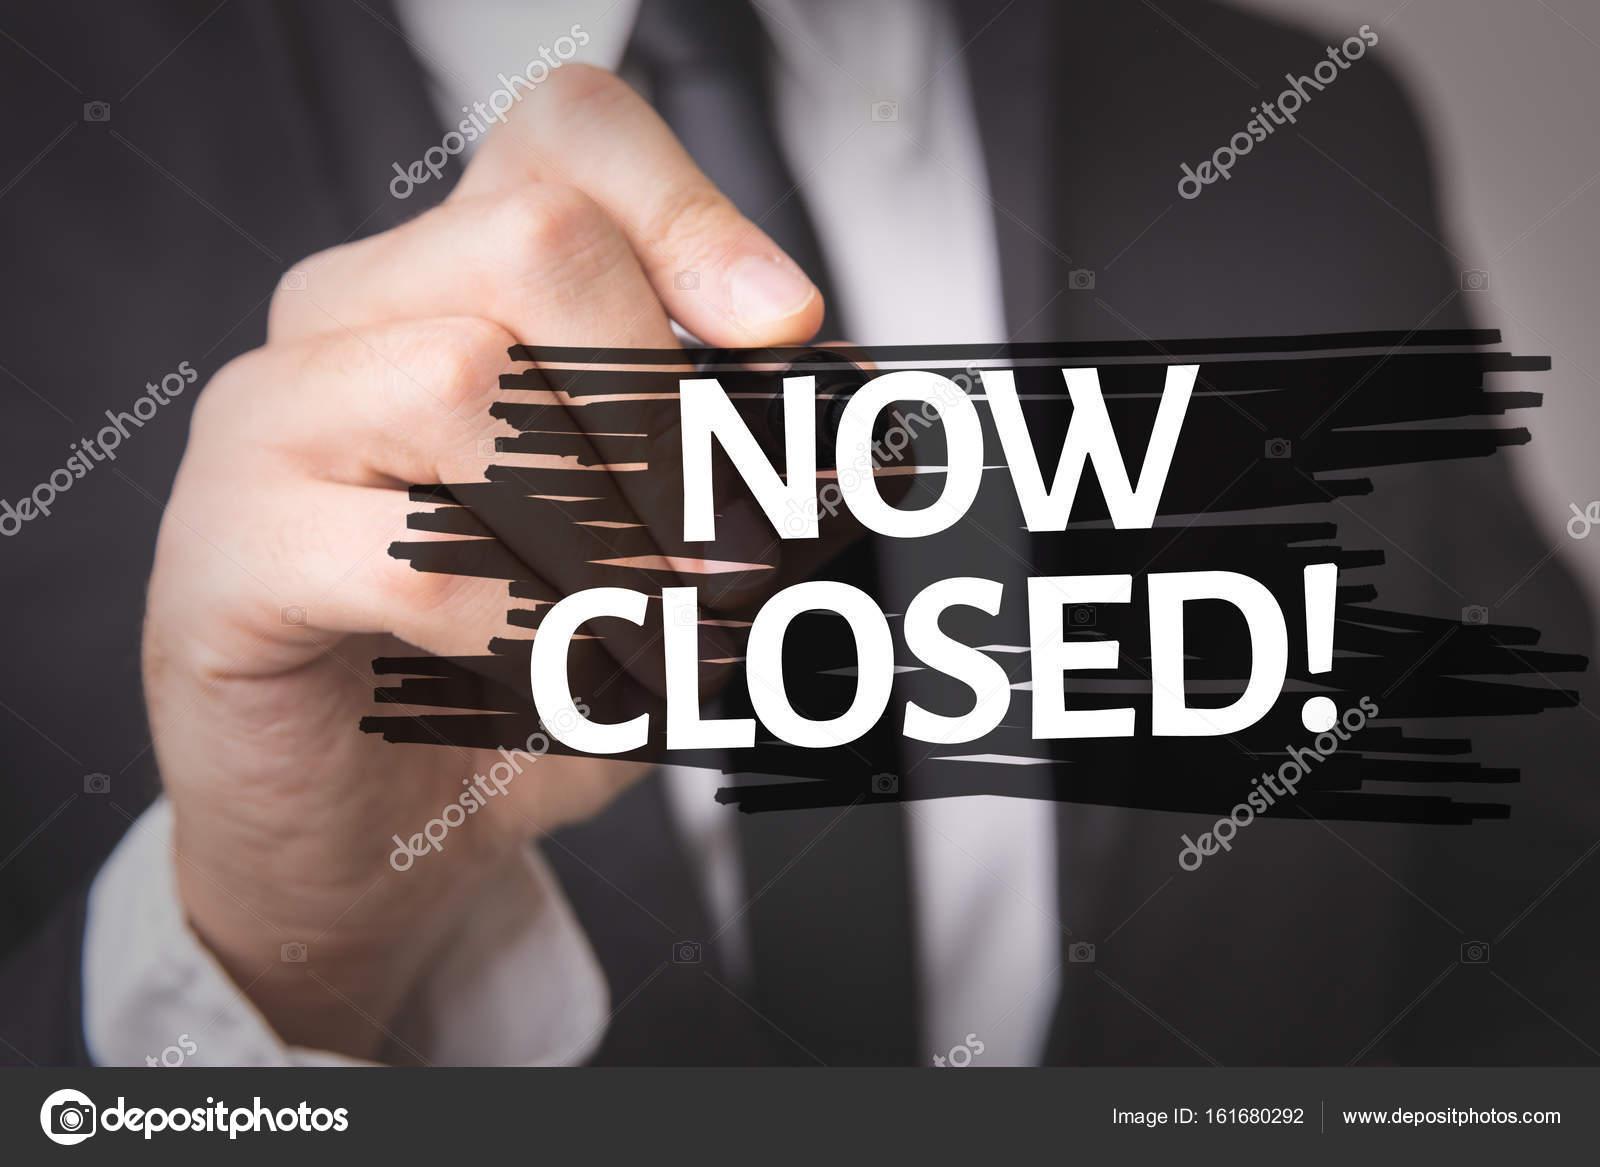 31dd1c17aa0b Τώρα κλειστό! σε μια εννοιολογική εικόνα — Φωτογραφία Αρχείου ...